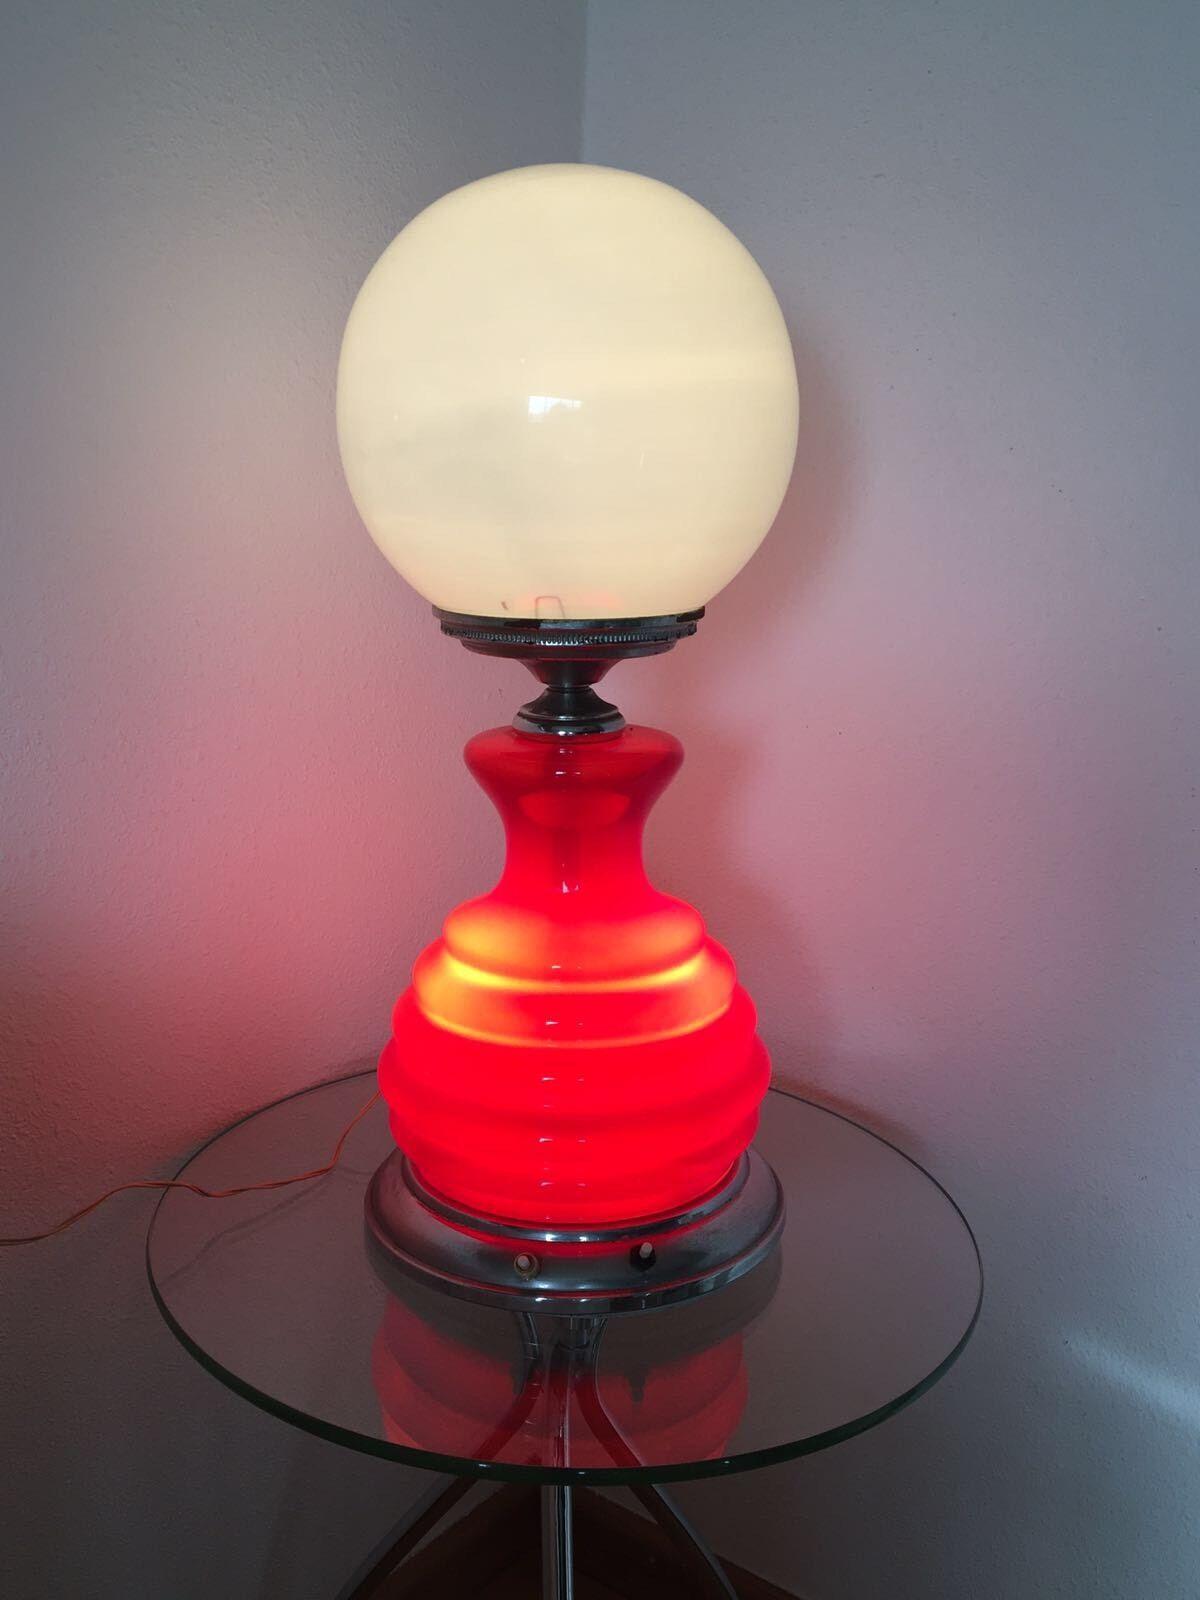 SXX-Lámpara De Sobremesa Vintage. -Vintage Desk Lamp. 60x25cms